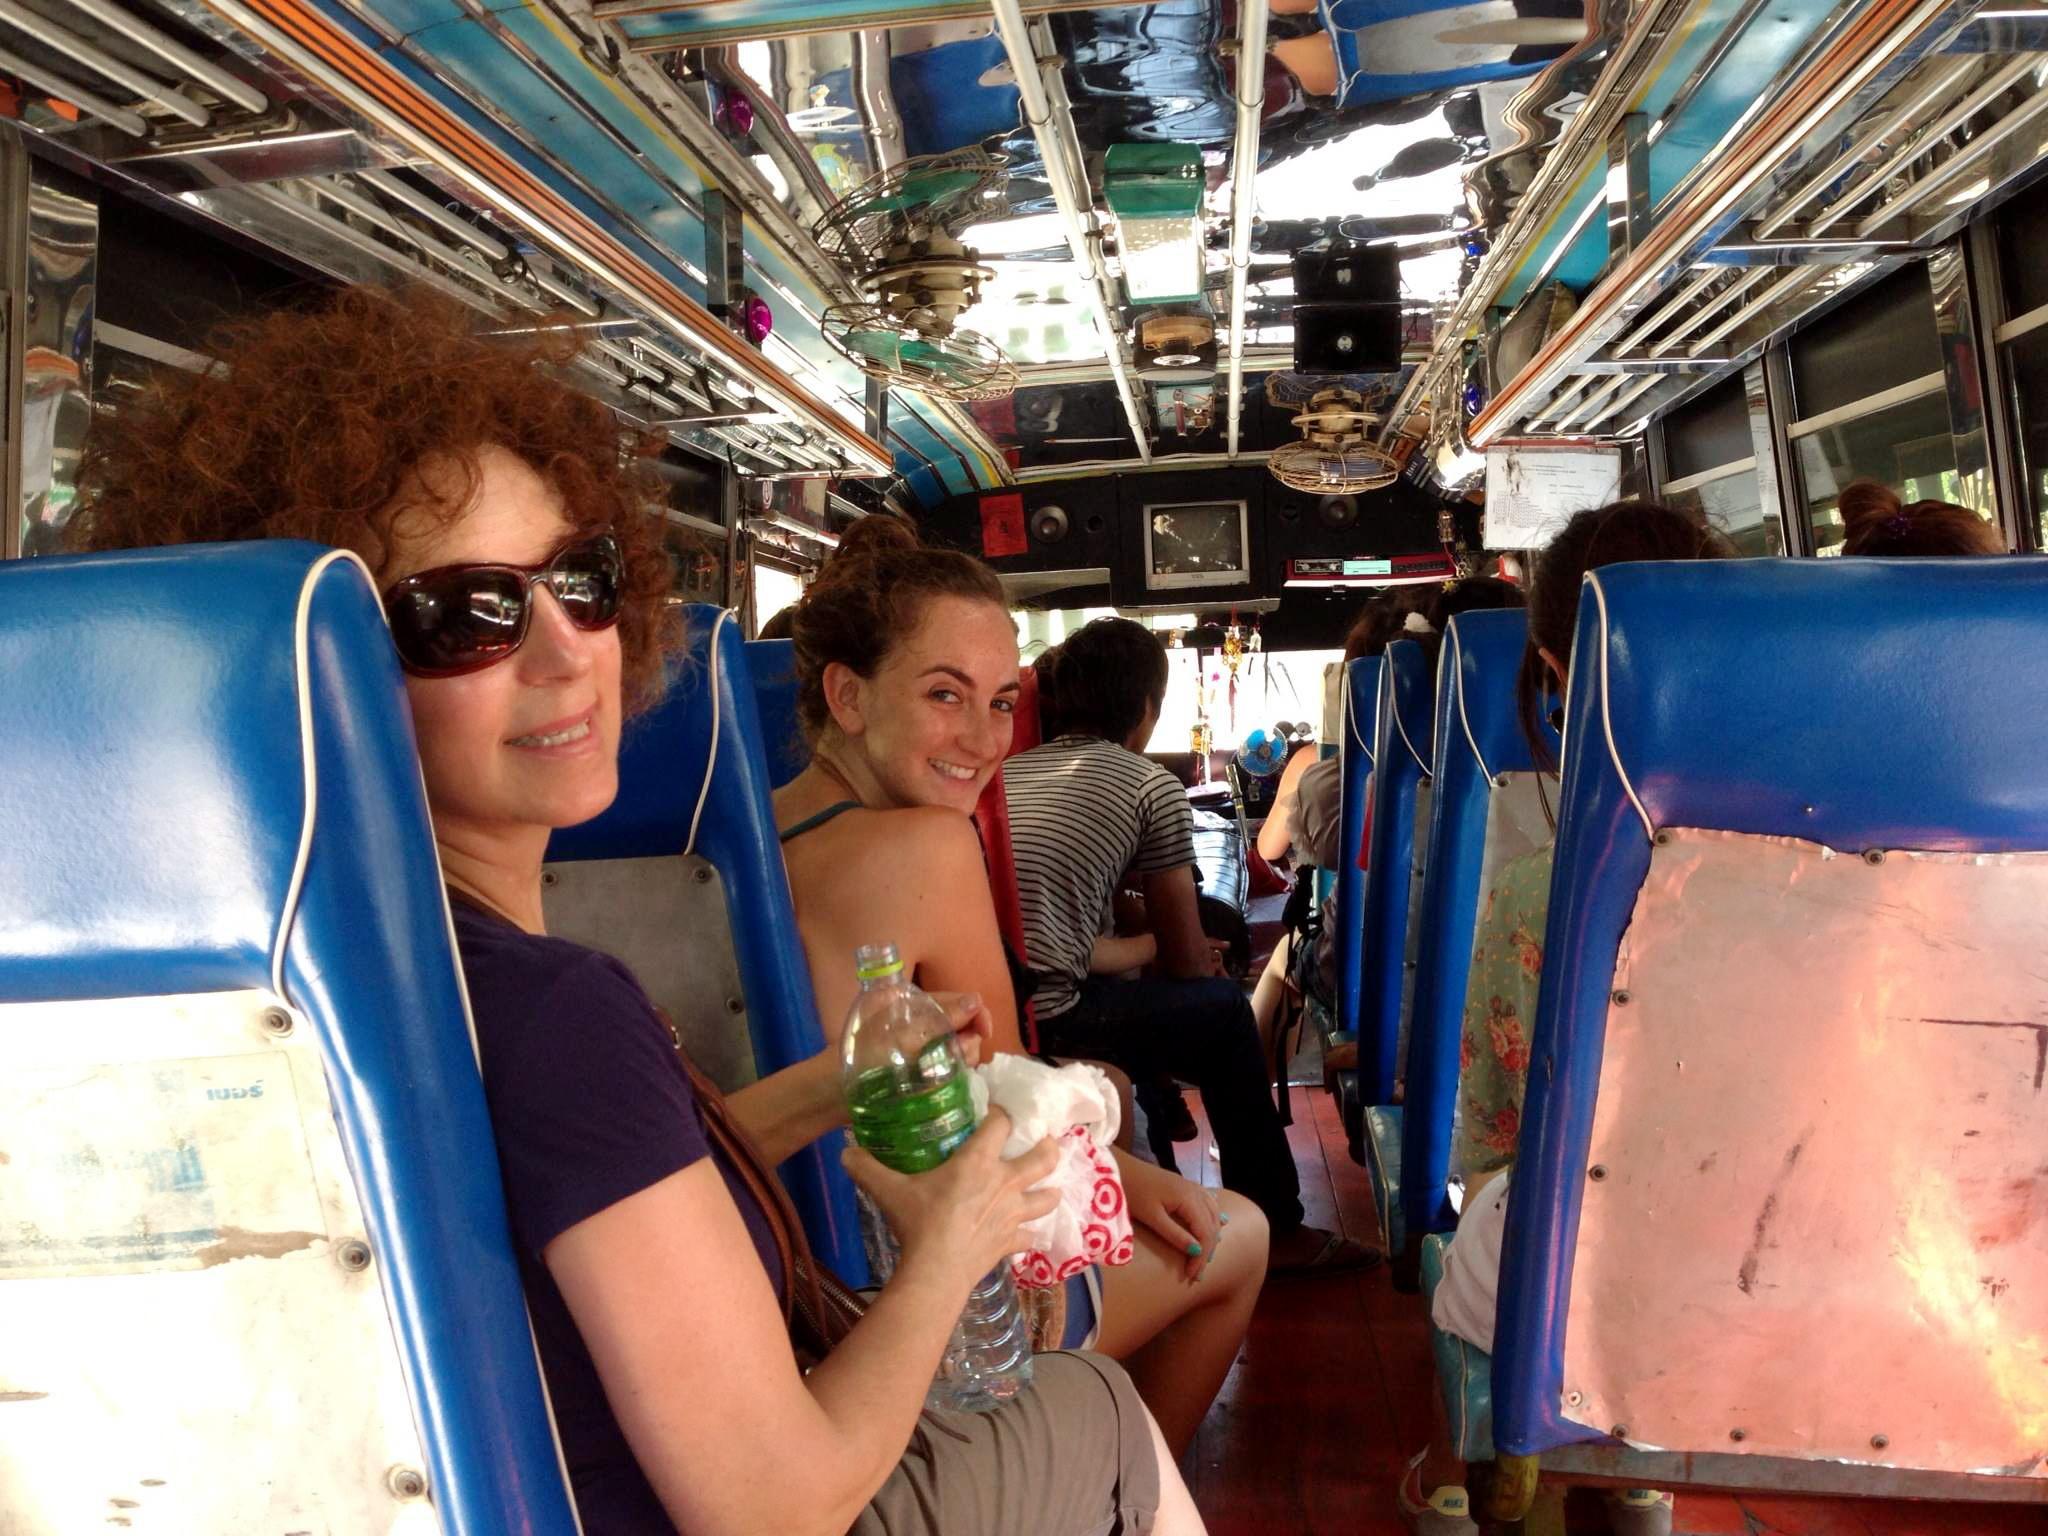 Bus ride with my parents from Kanchanaburi back to Bangkok